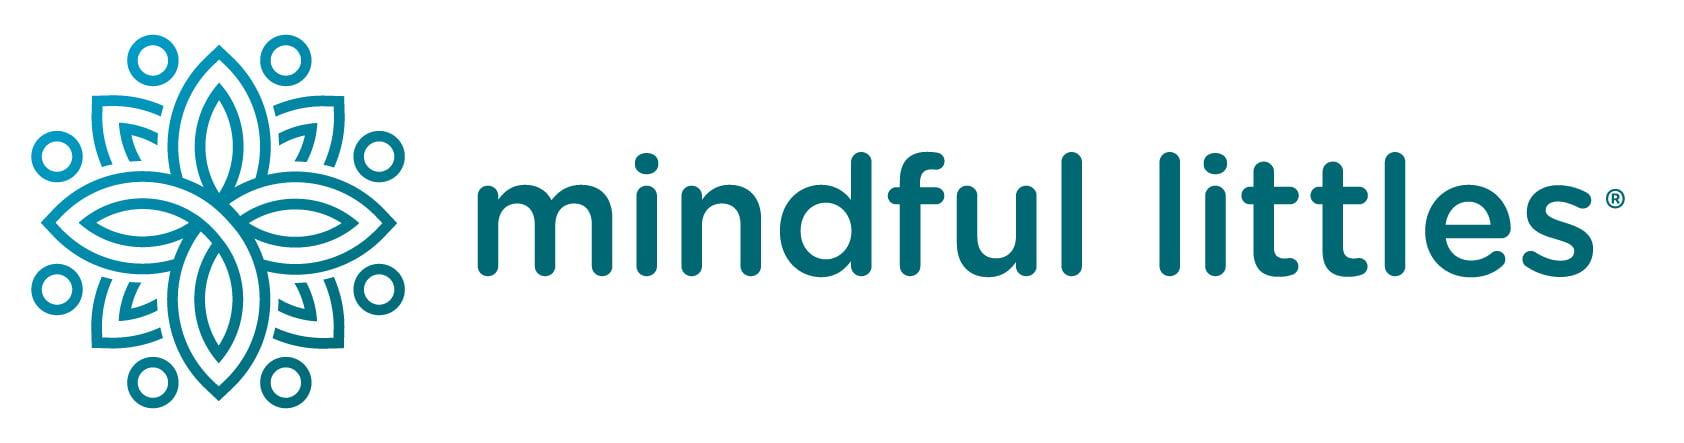 mindful littles